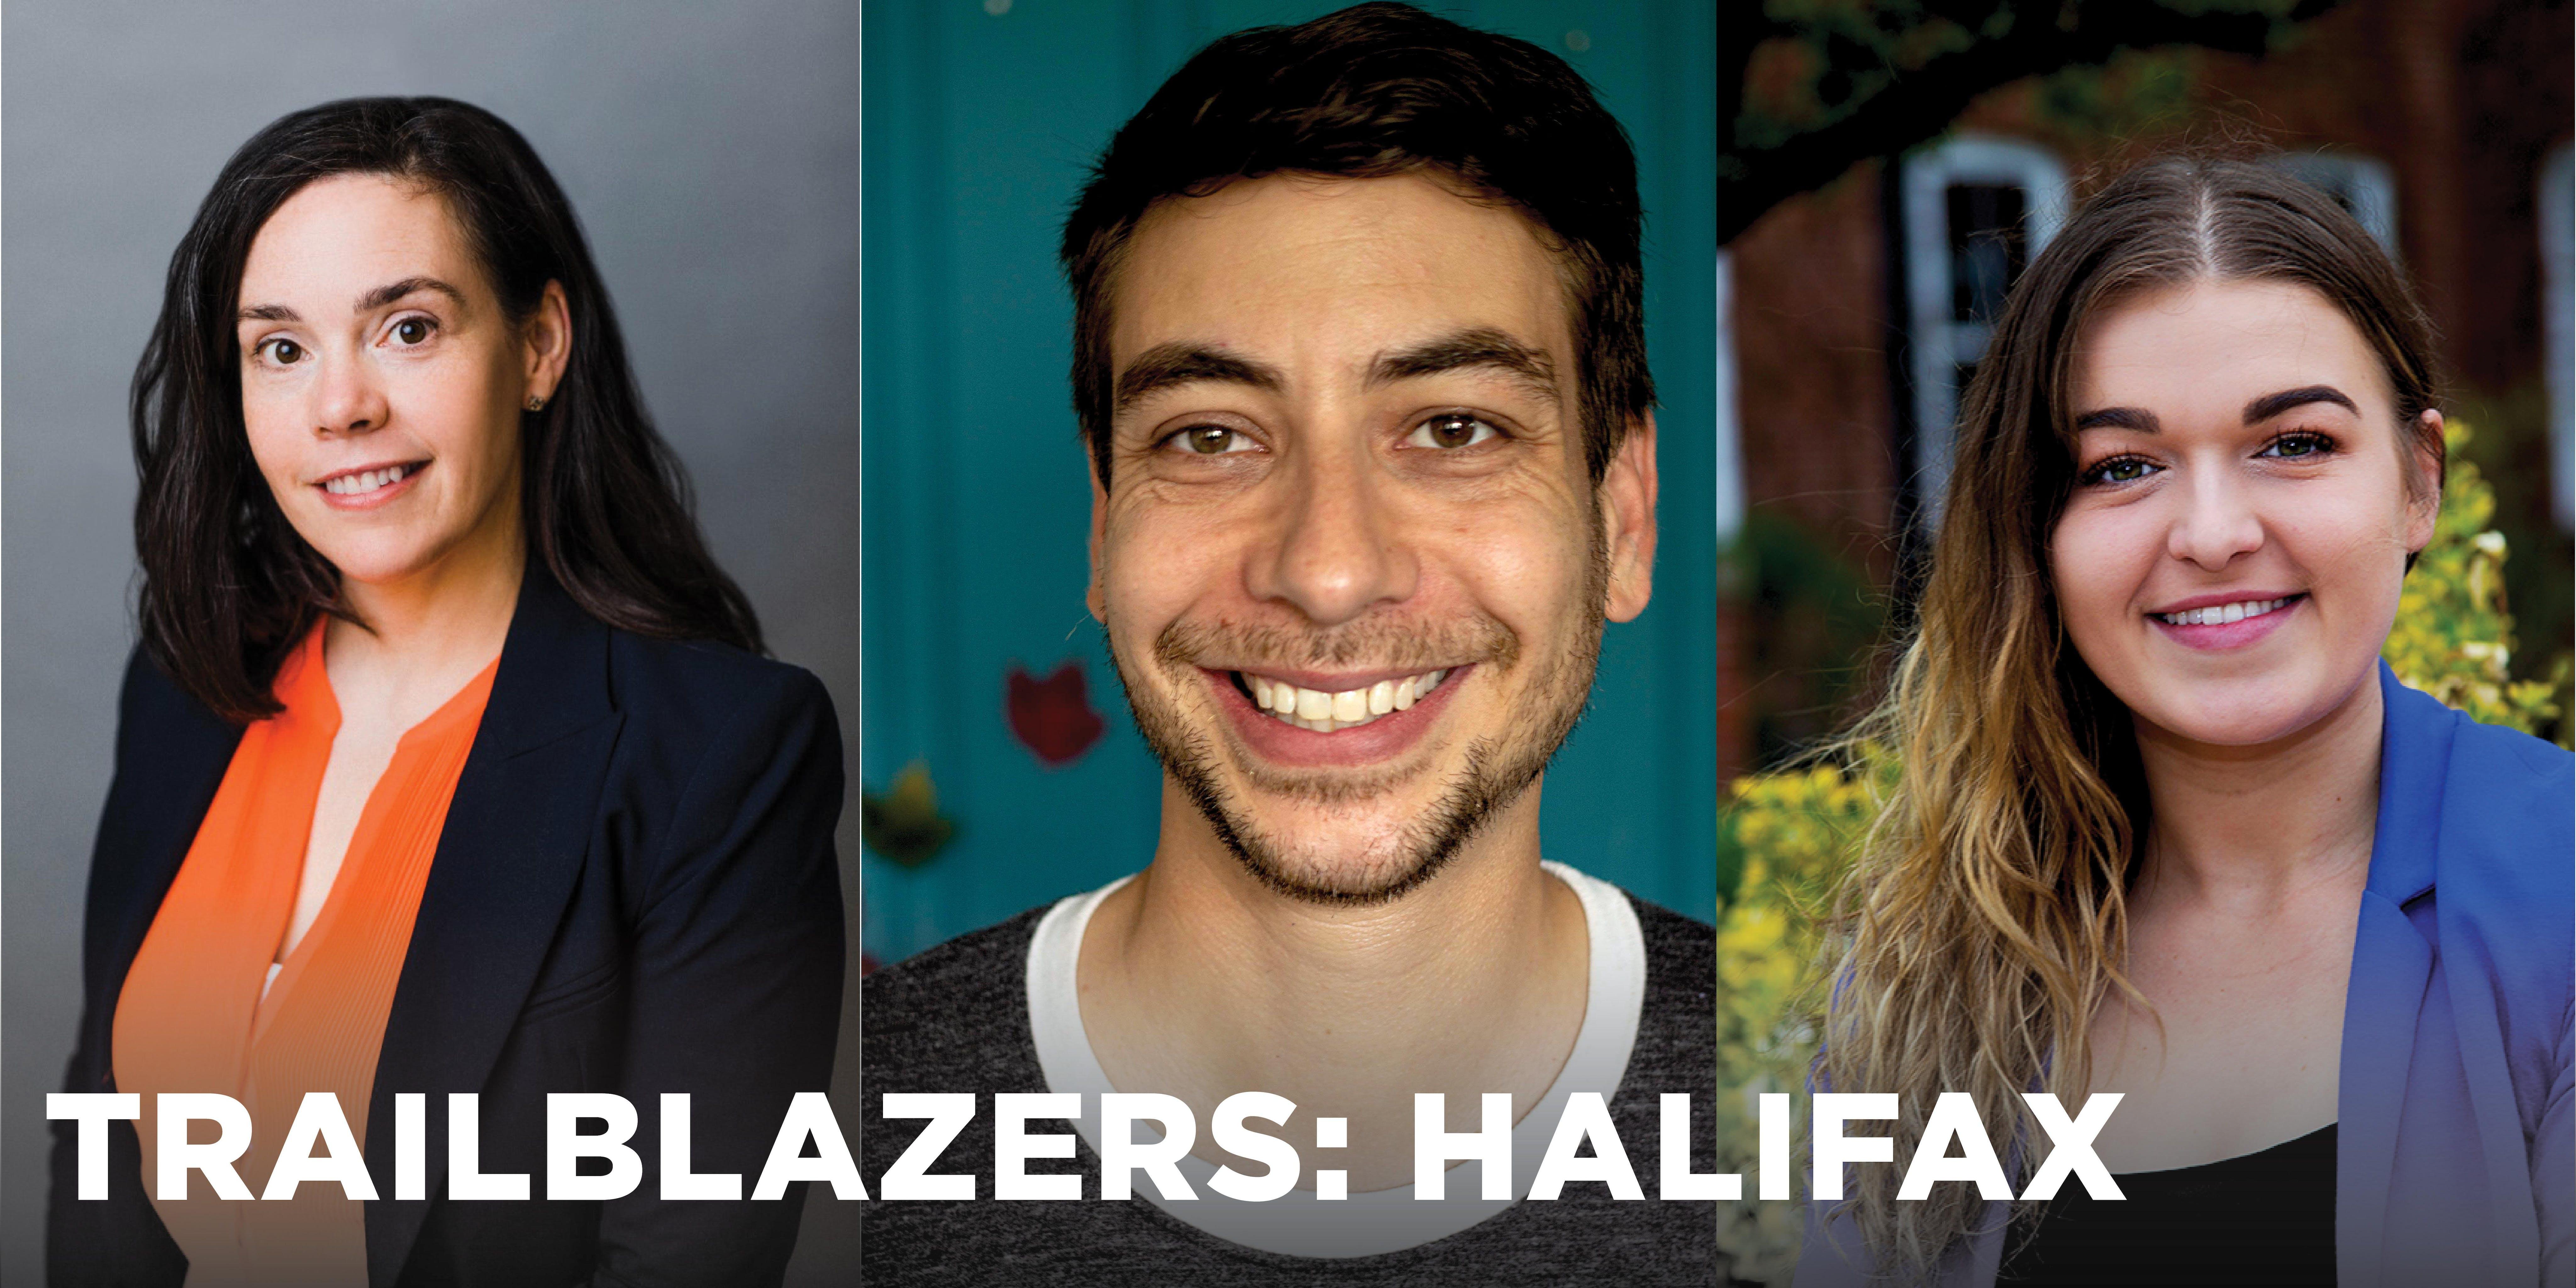 Trailblazers 2019: Halifax